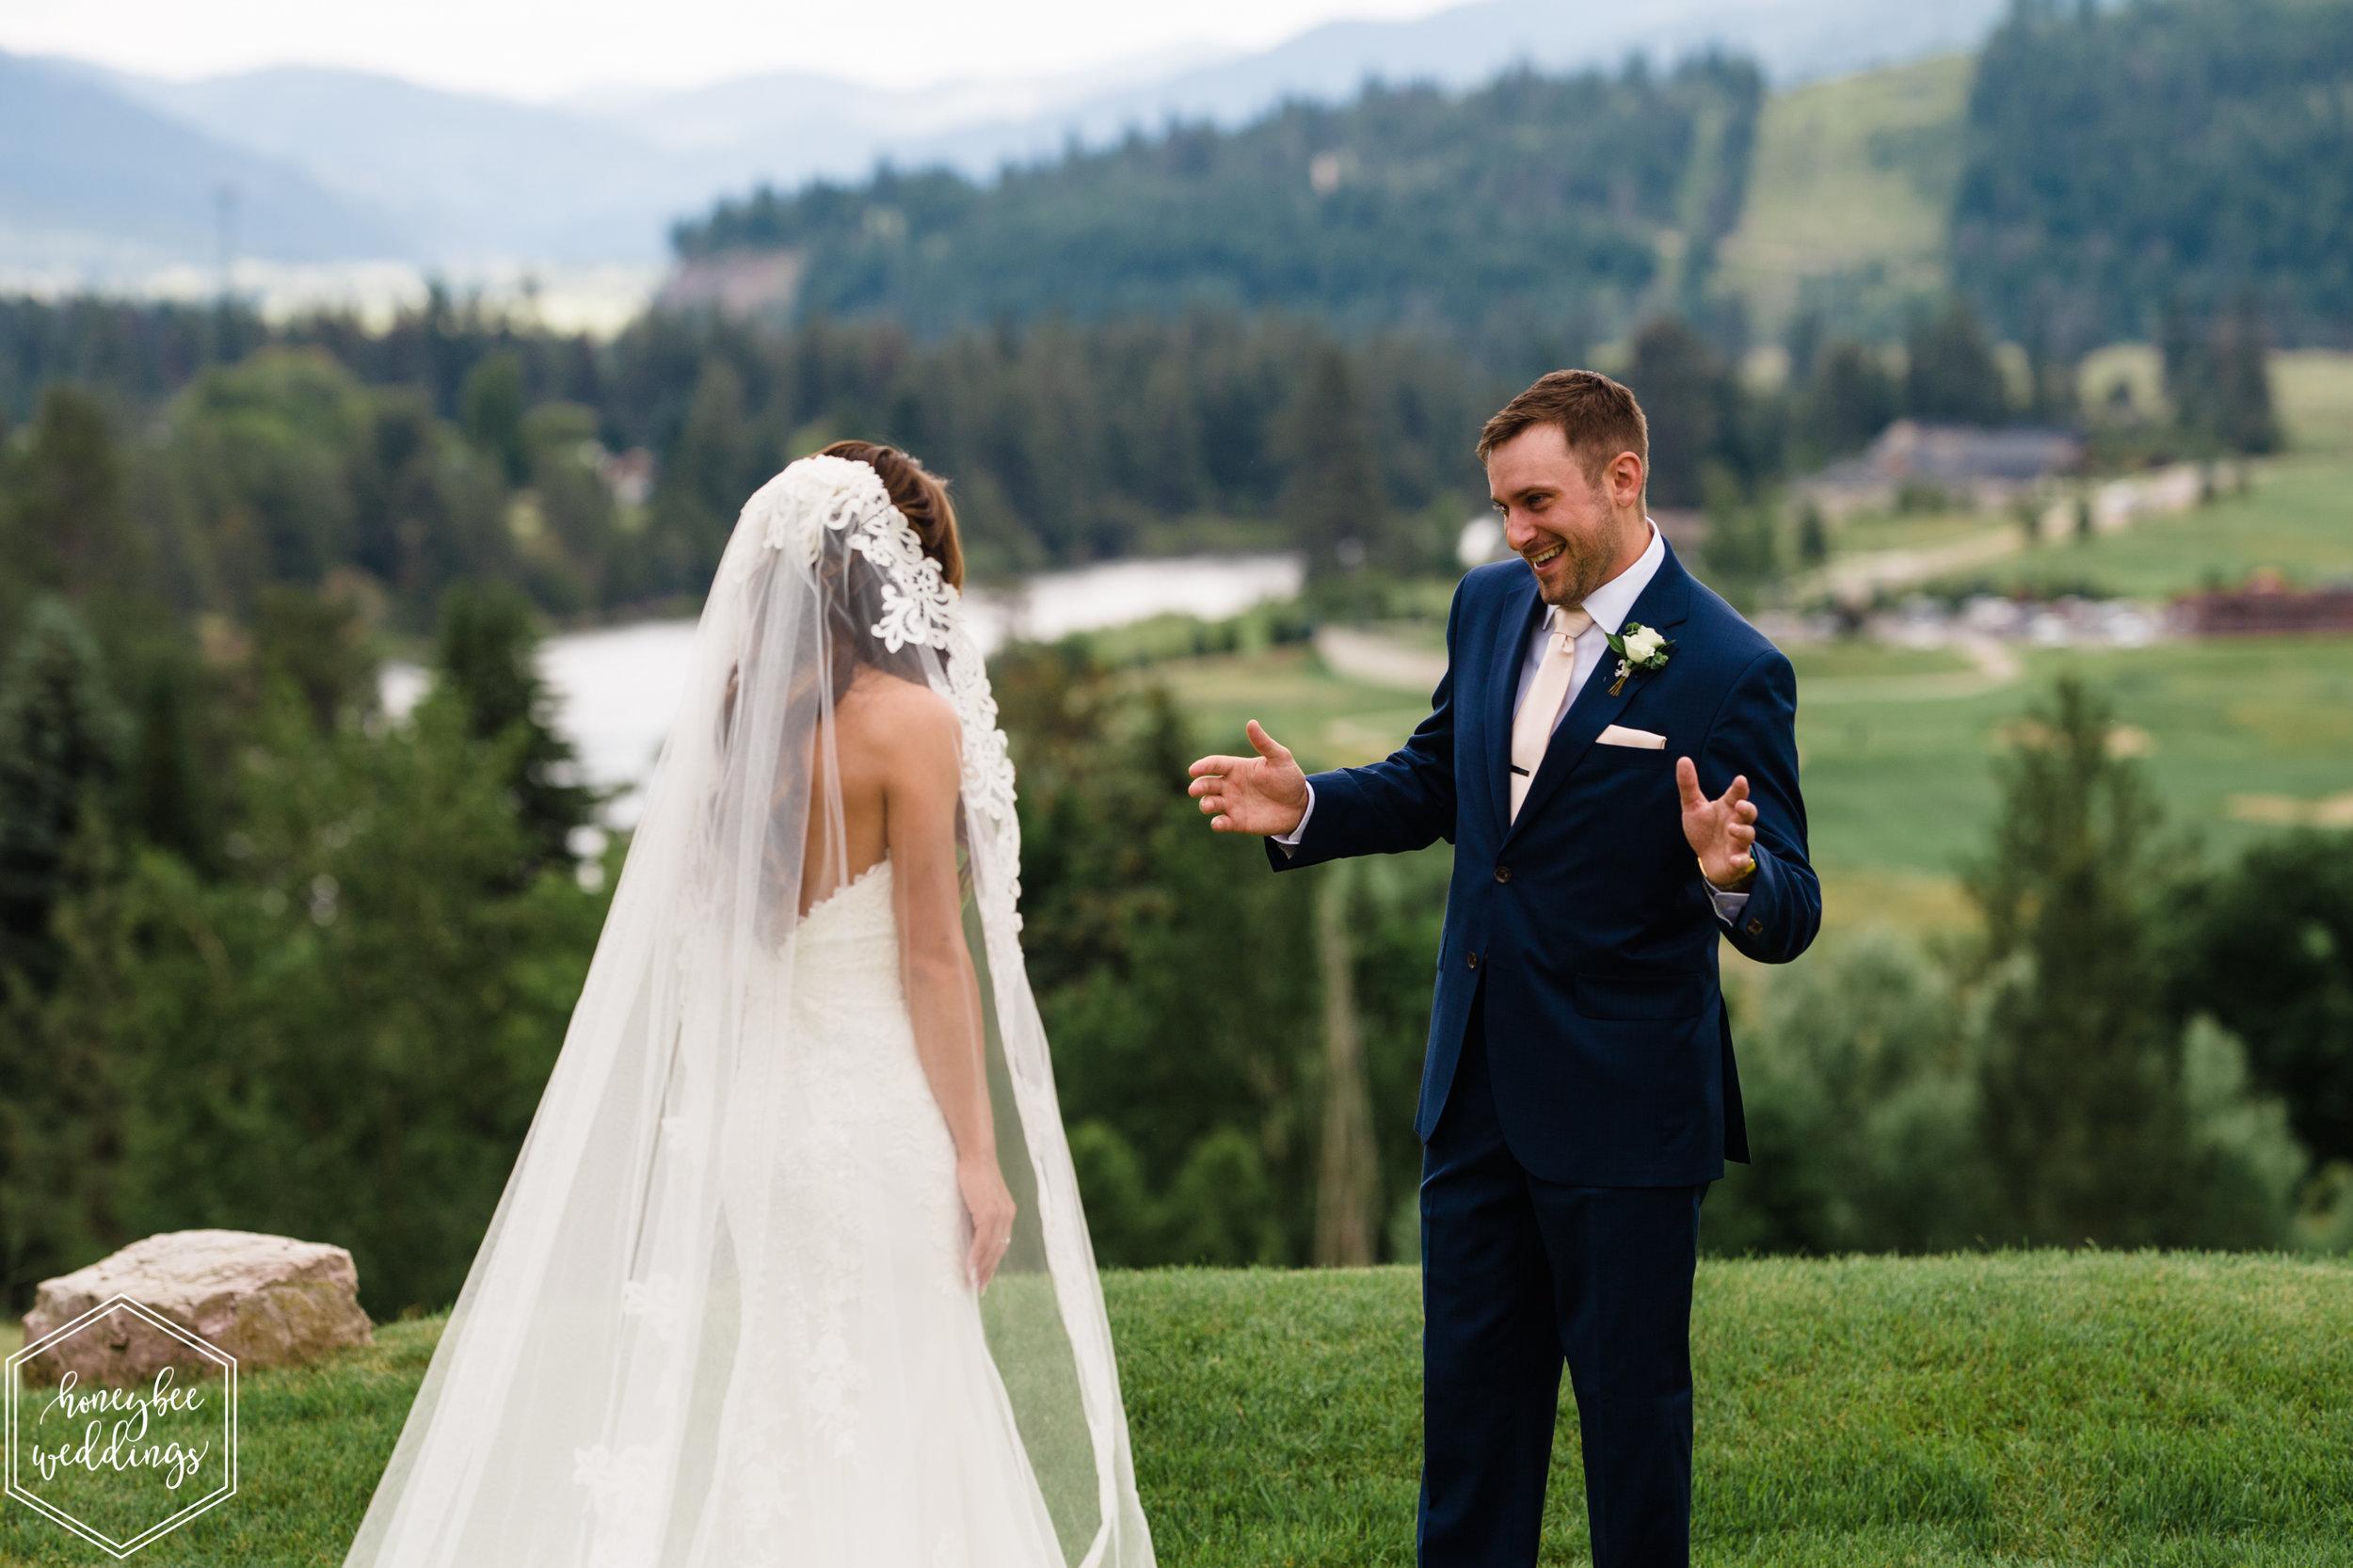 019Montana Wedding Photographer_Missoula Wedding_Honeybee Weddings_Devlin & Jacob_June 22, 2019-1436.jpg